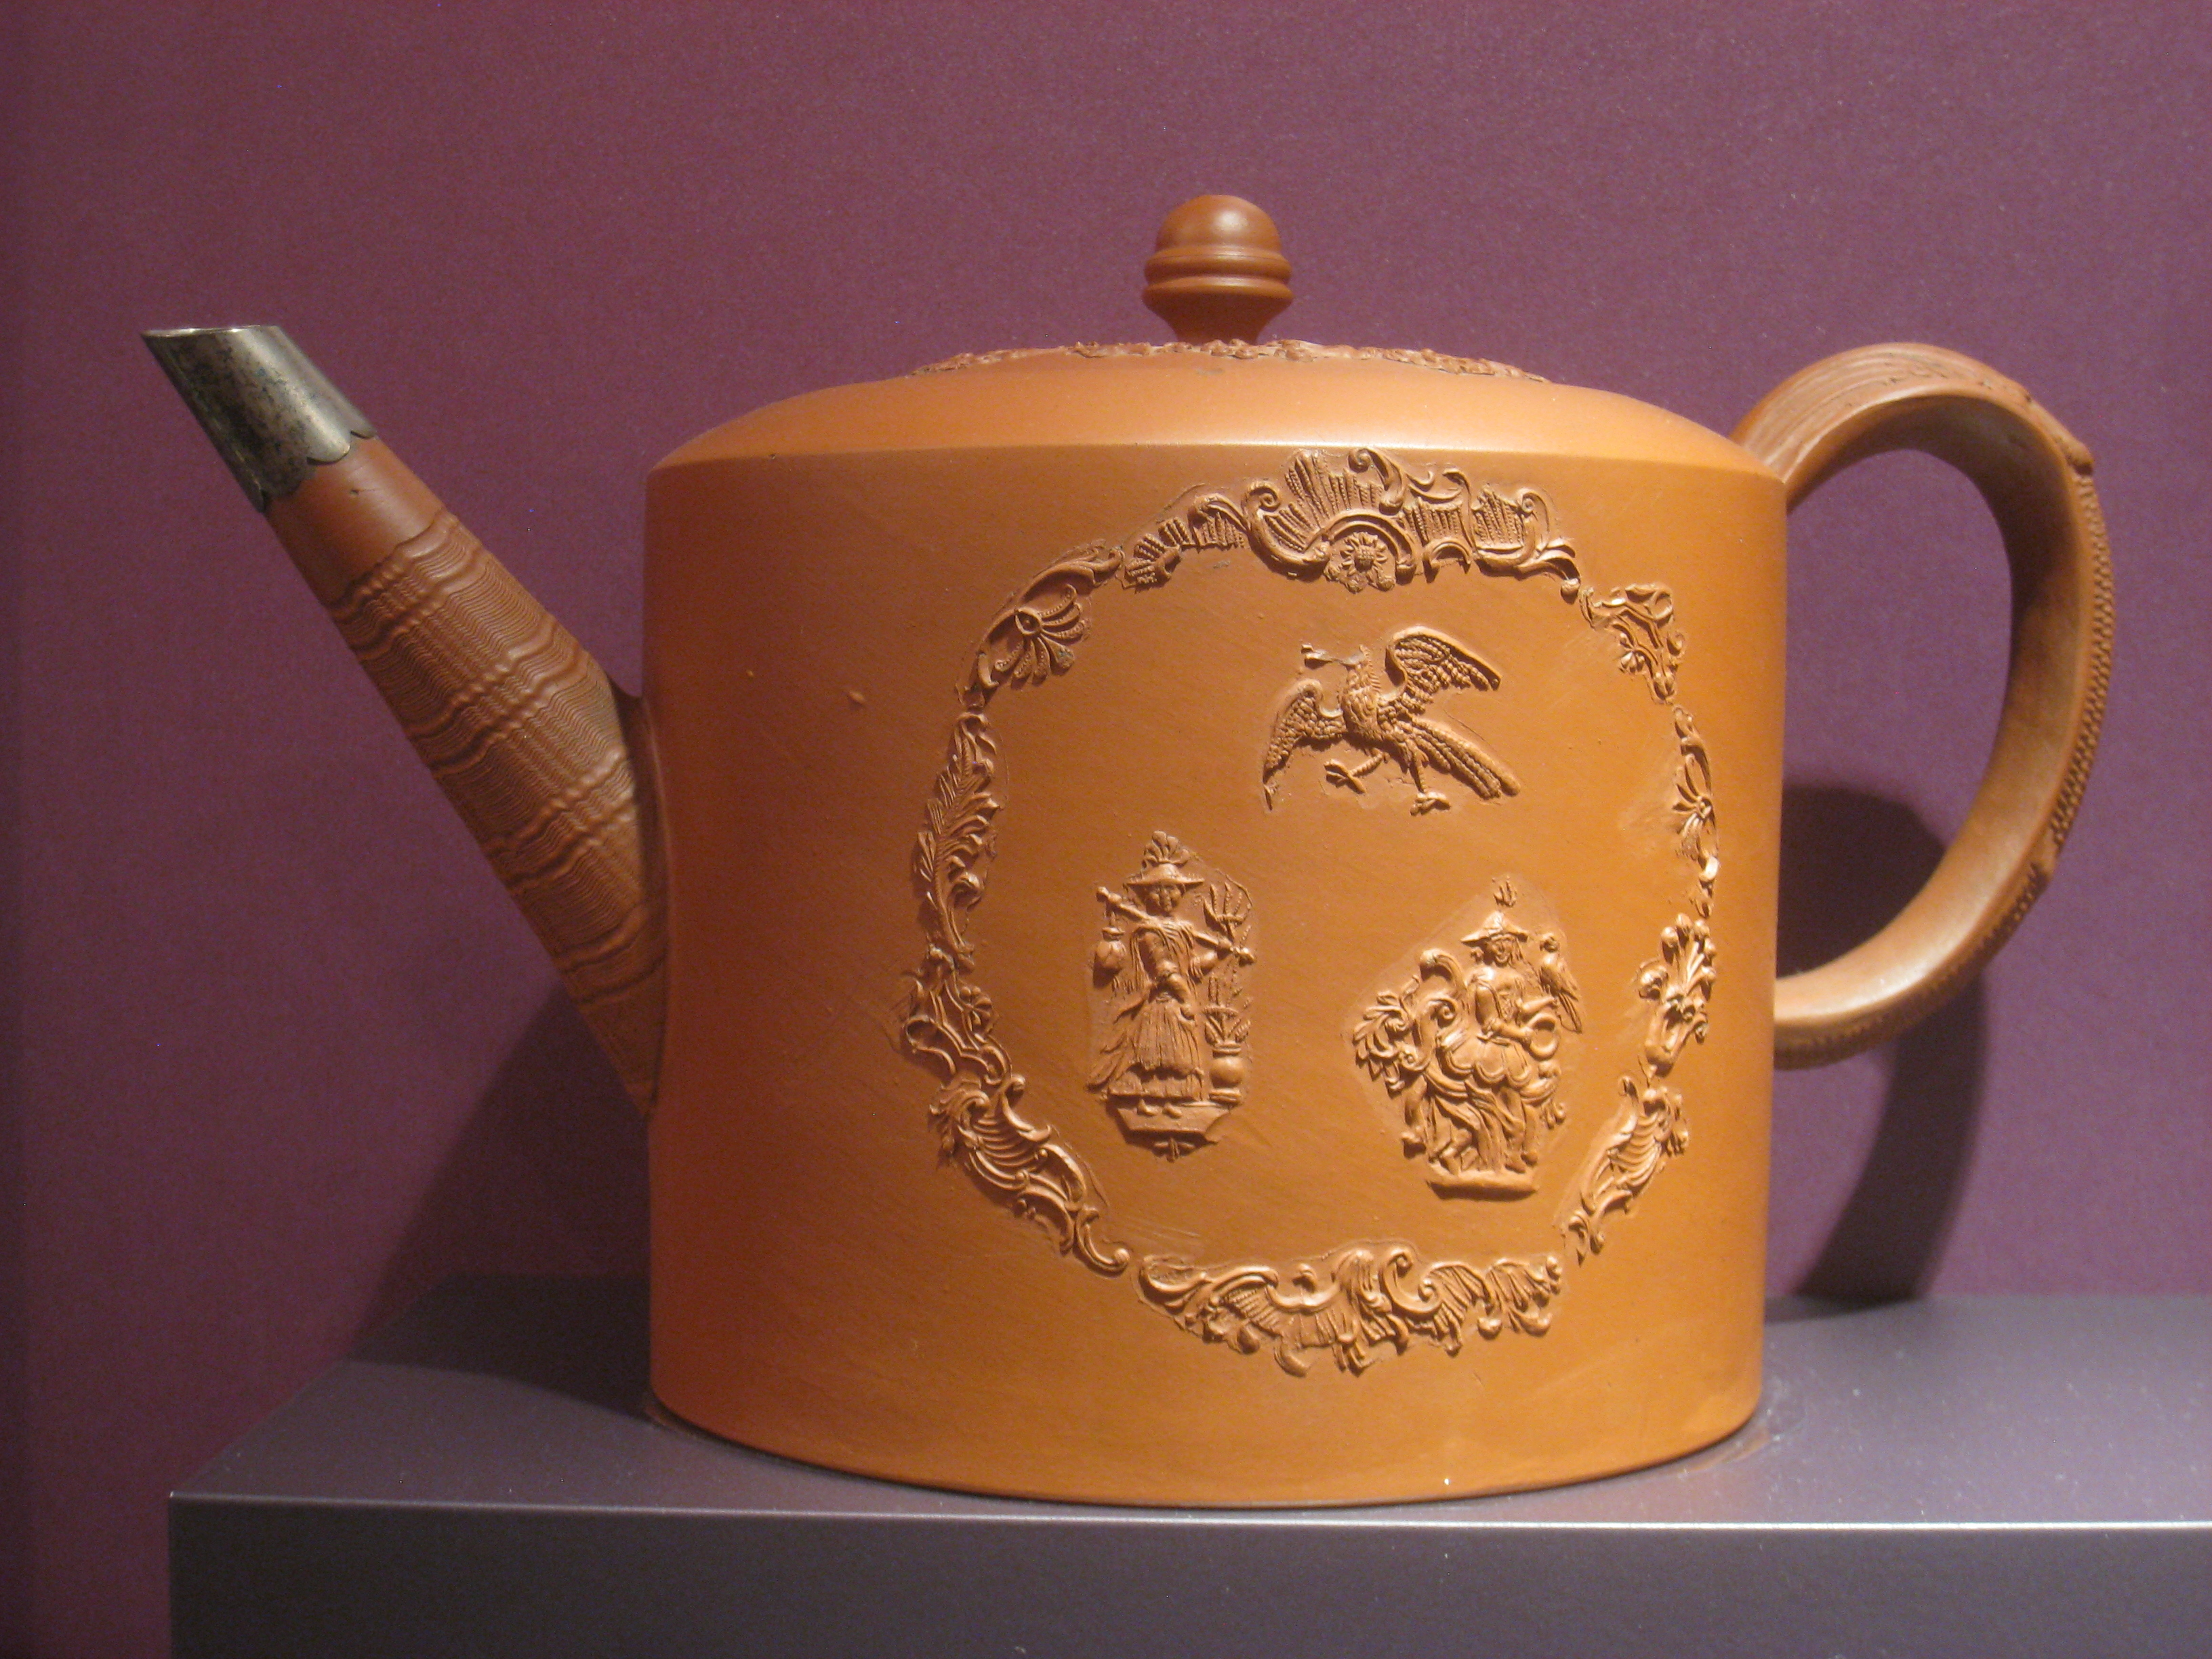 Staffordshire Potteries - Wikipedia